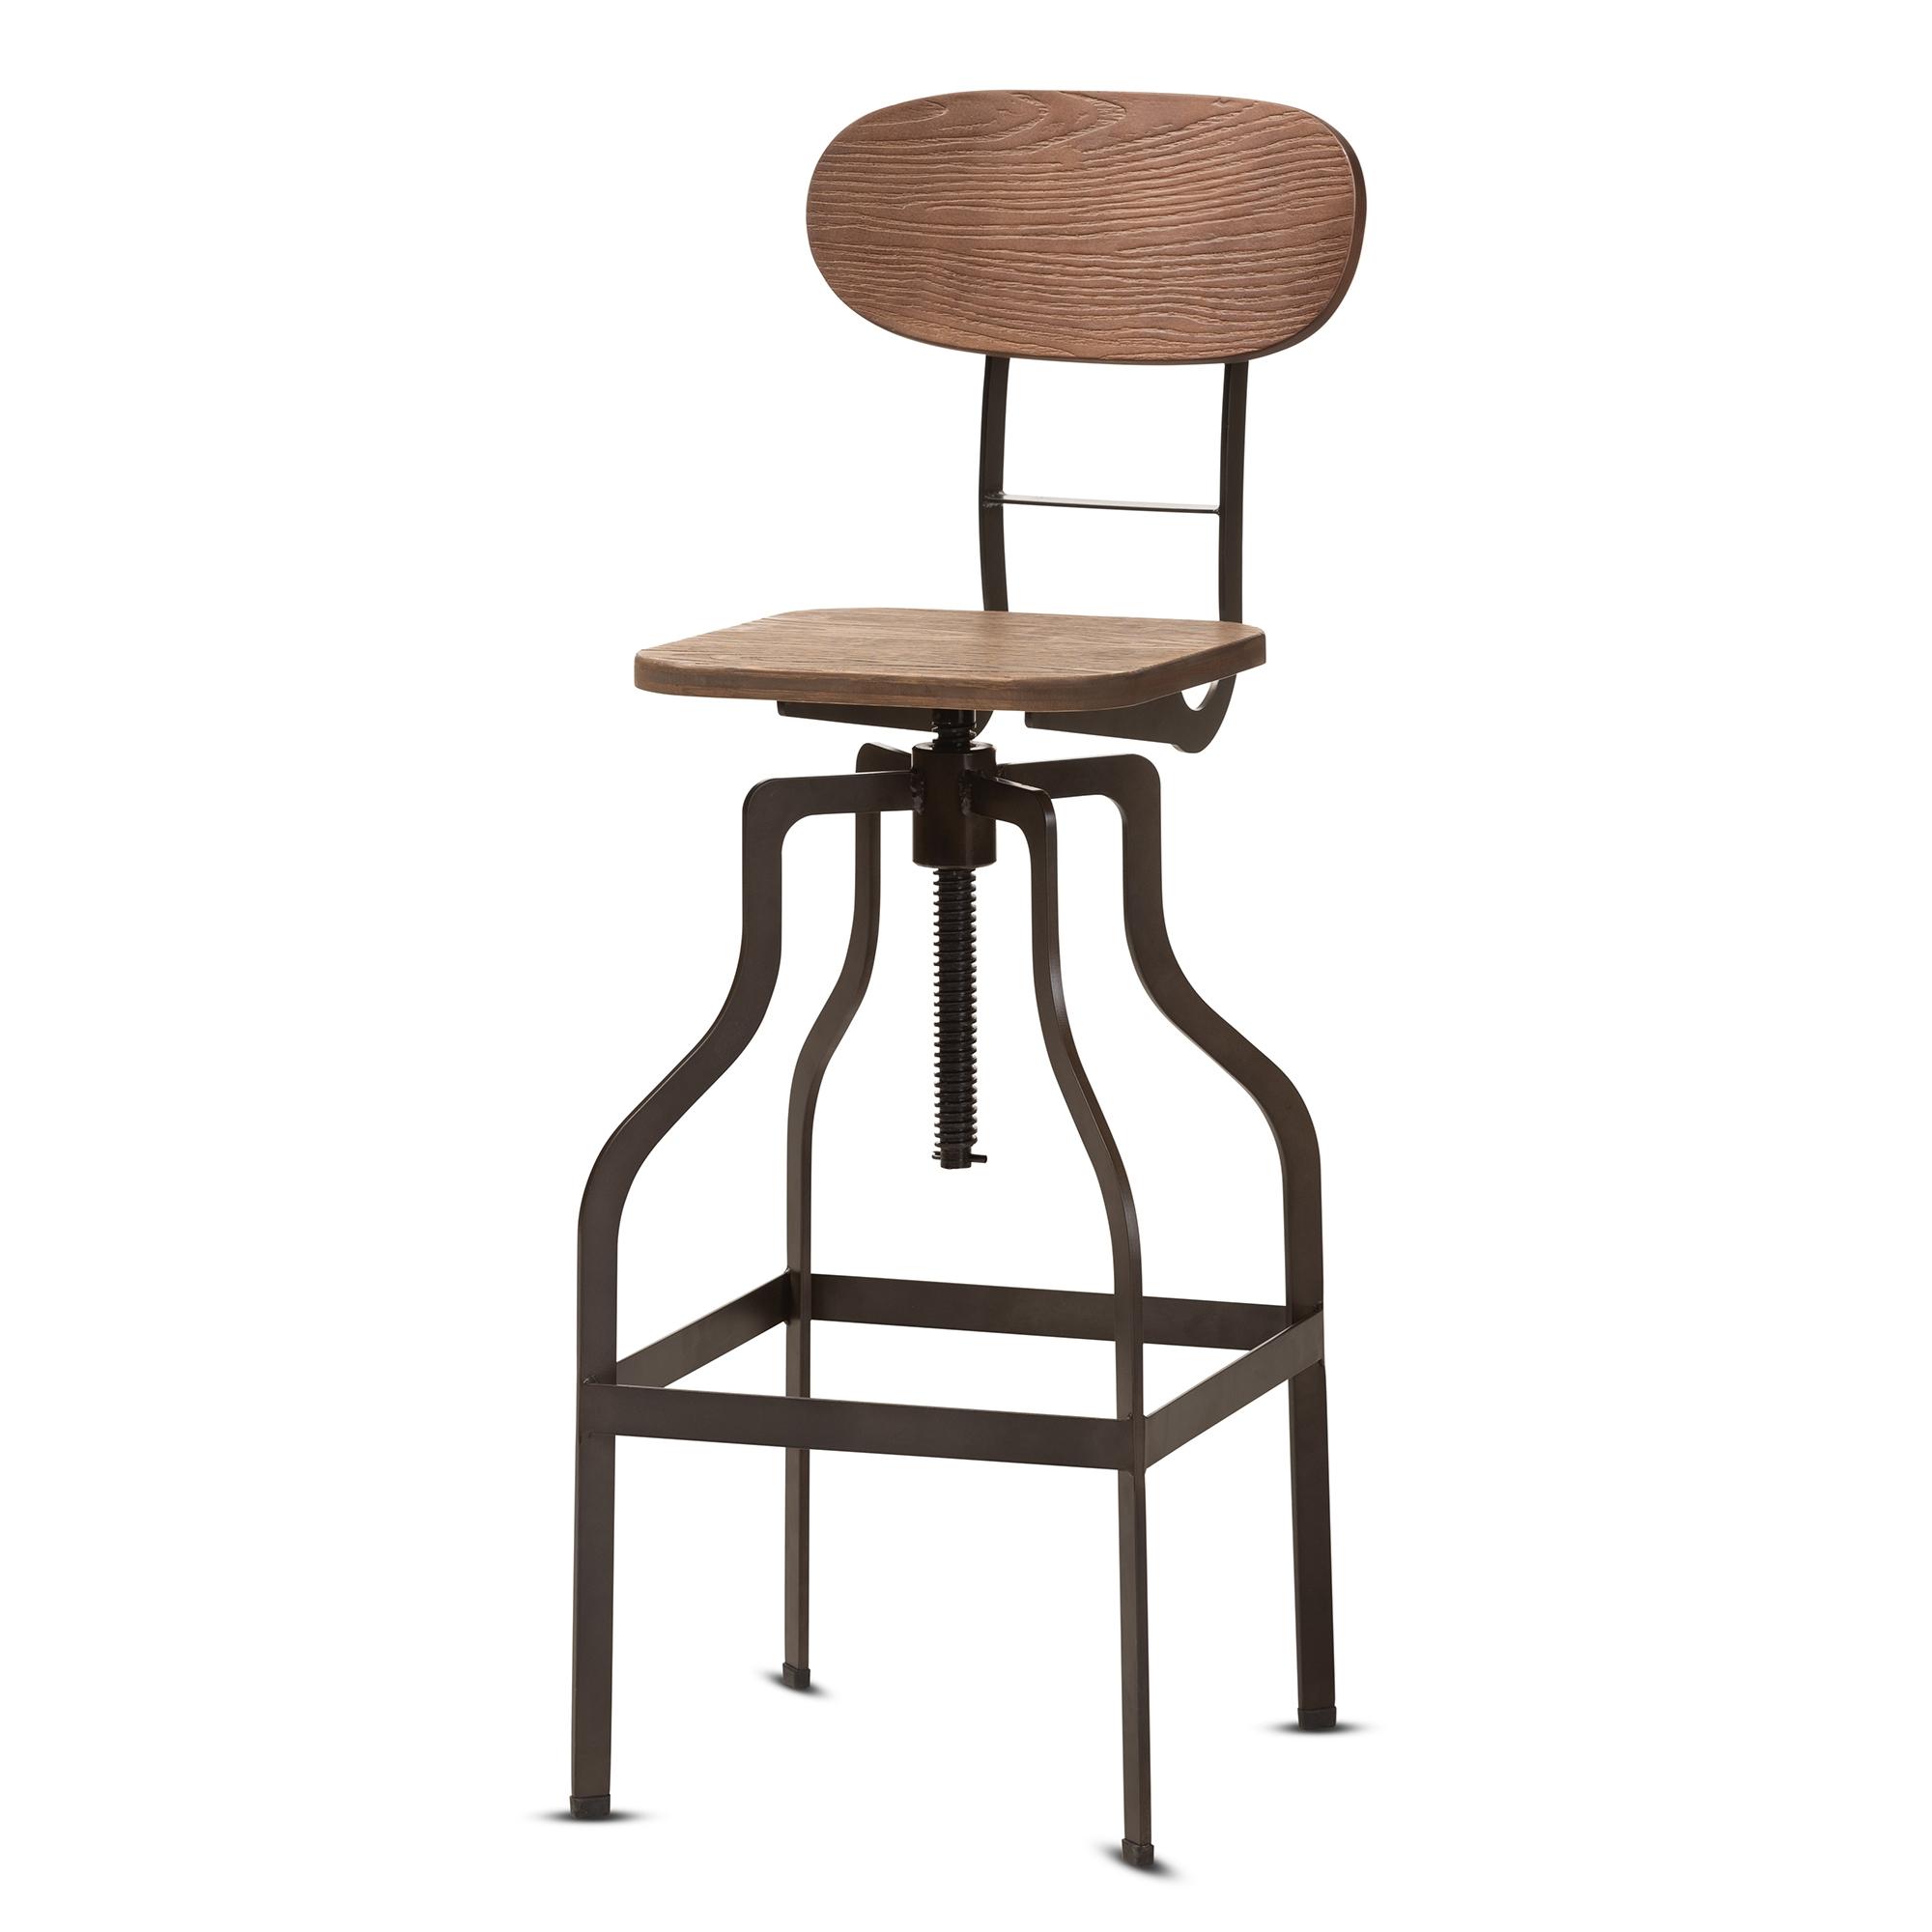 Astonishing Baxton Studio Varek Vintage Rustic Industrial Style Wood And Inzonedesignstudio Interior Chair Design Inzonedesignstudiocom